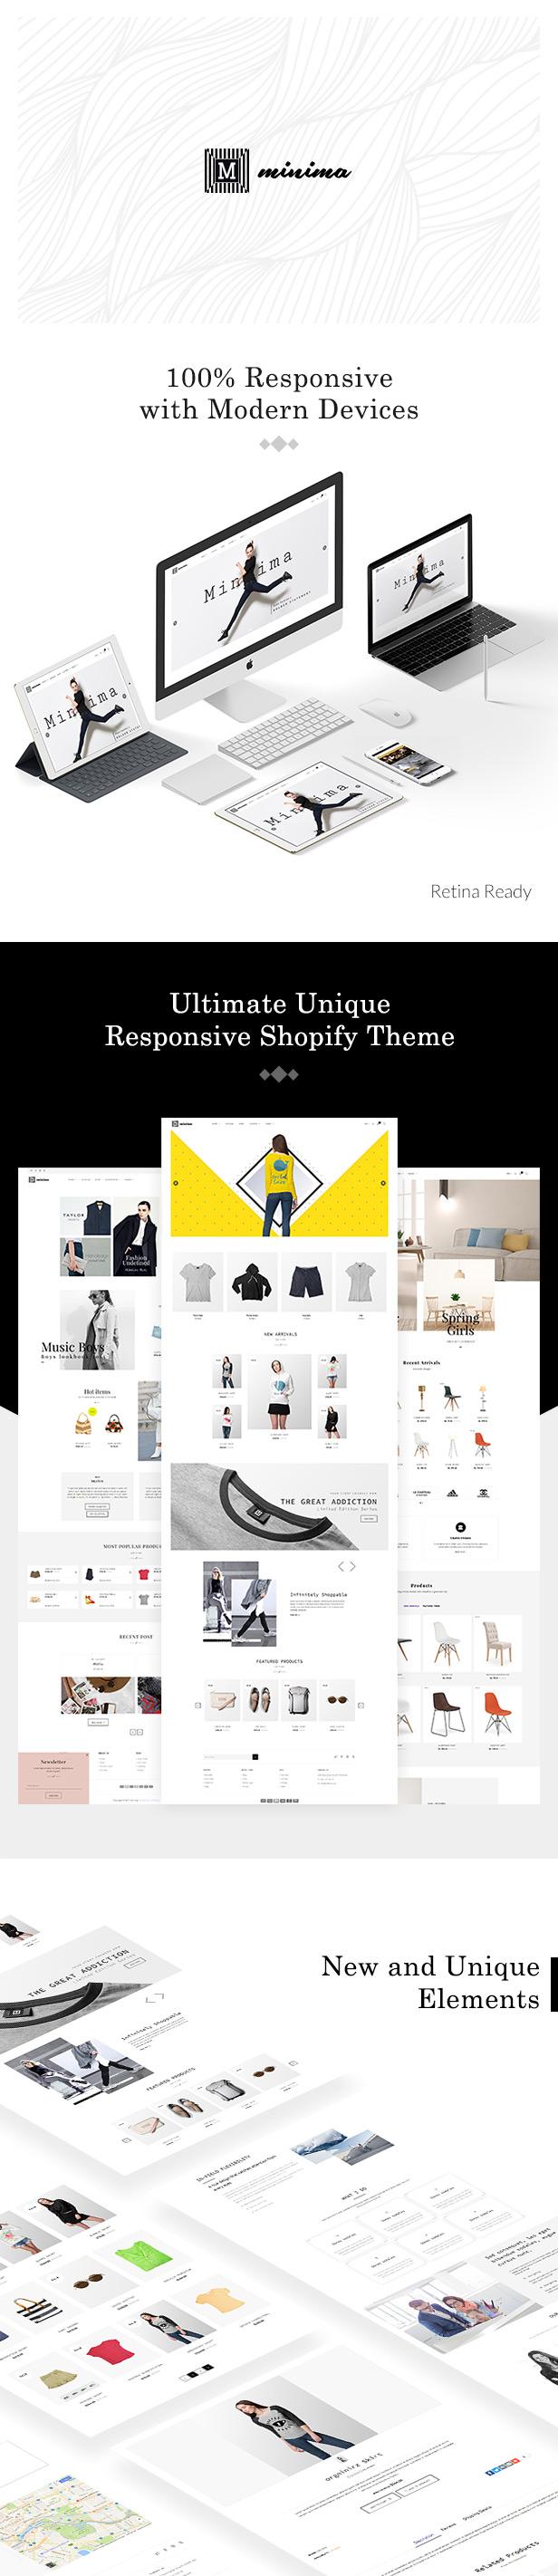 Minima | Minimal Shopify - 2 Minima | Minimal Shopify